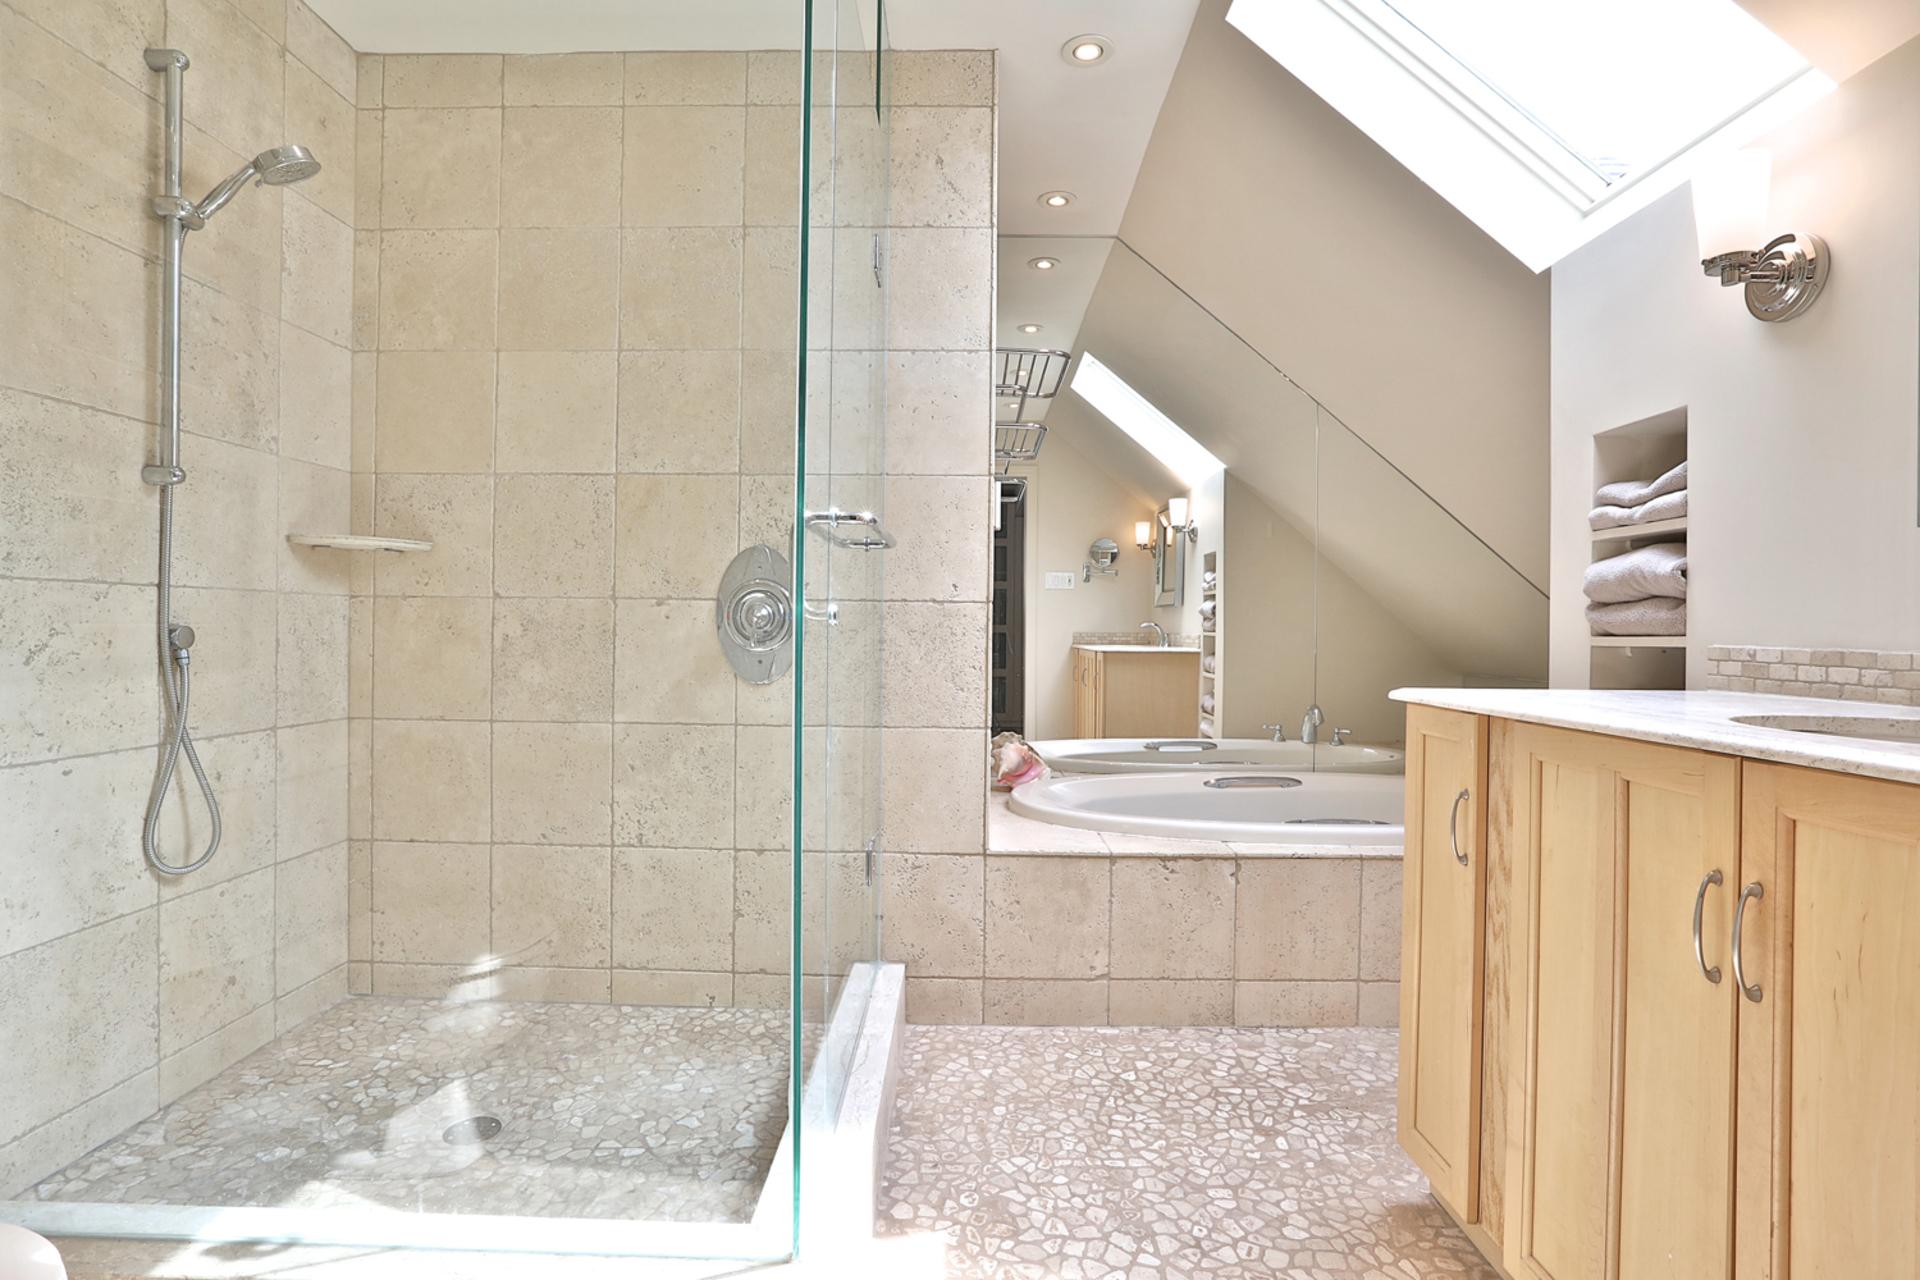 4 Piece Ensuite Bathroom at 32 Geraldine Court, Parkwoods-Donalda, Toronto